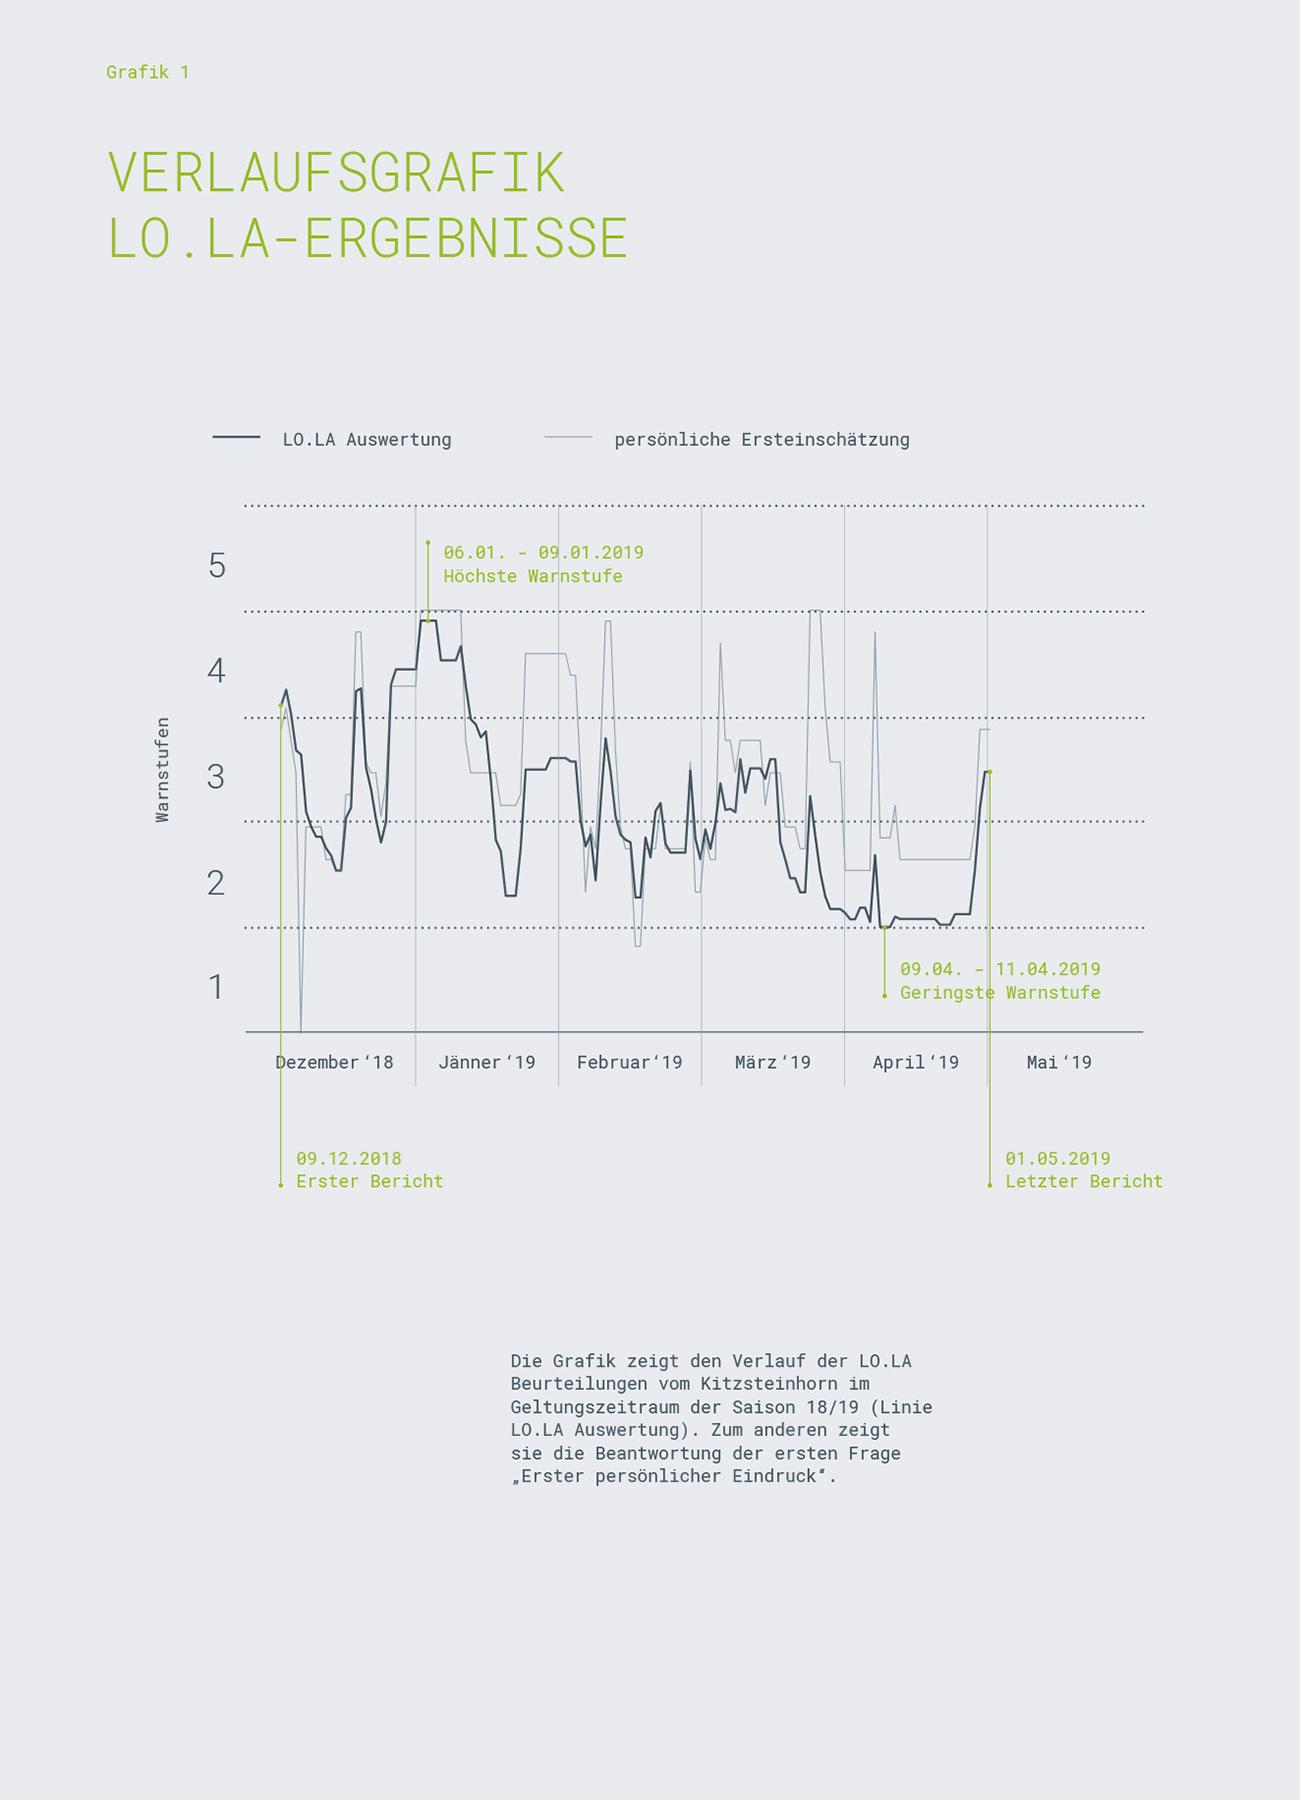 Kitzsteinhorn, Grafik LO.LA-Ergebnisse | LO.LA Alpine Safety Management